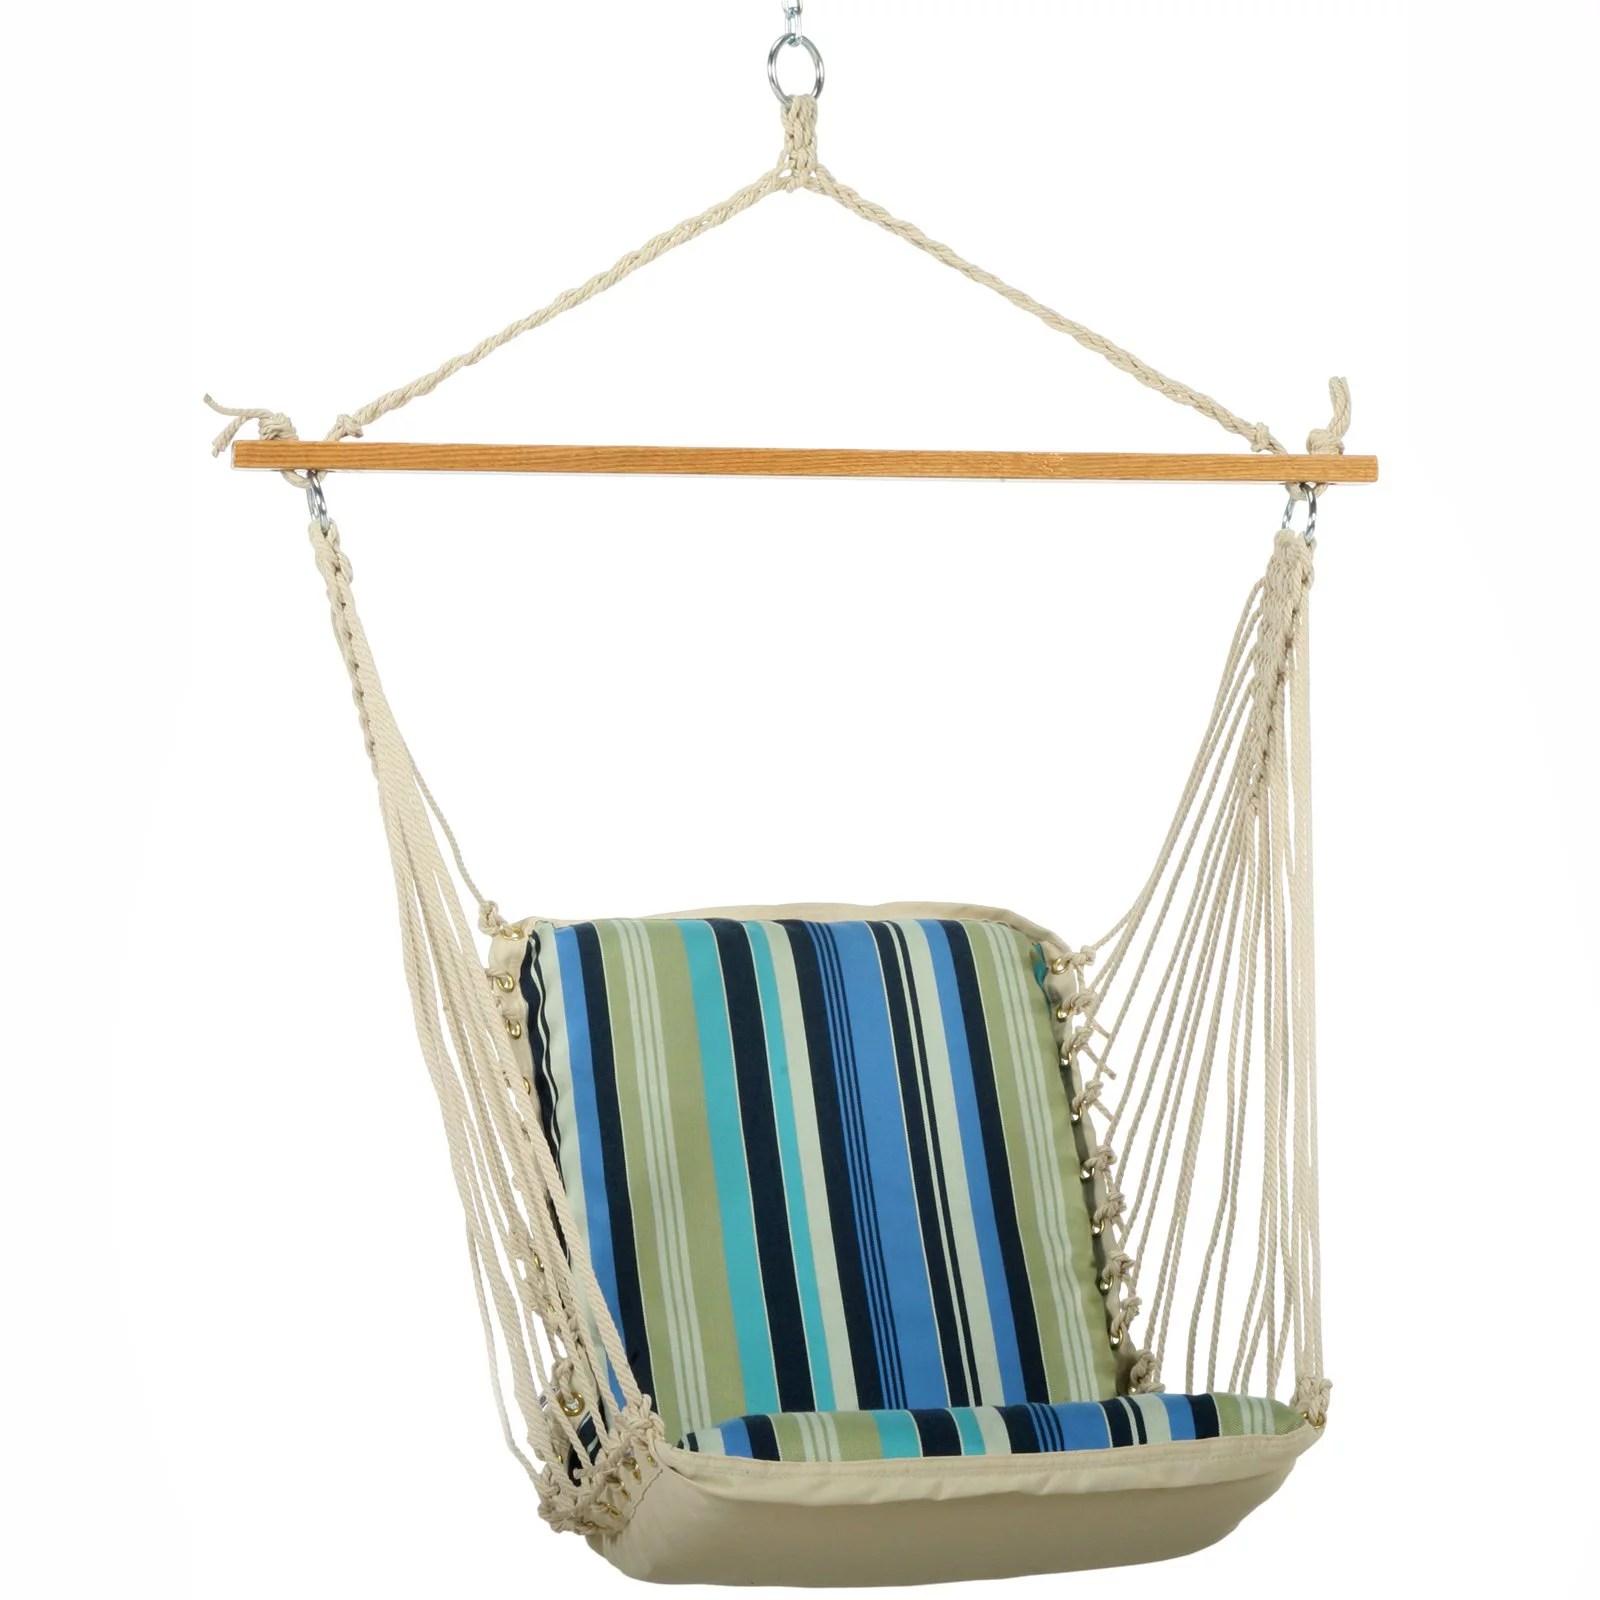 hanging chair bolt bubble under 200 pawleys island beaches stripe cushioned single hammock swing walmart com